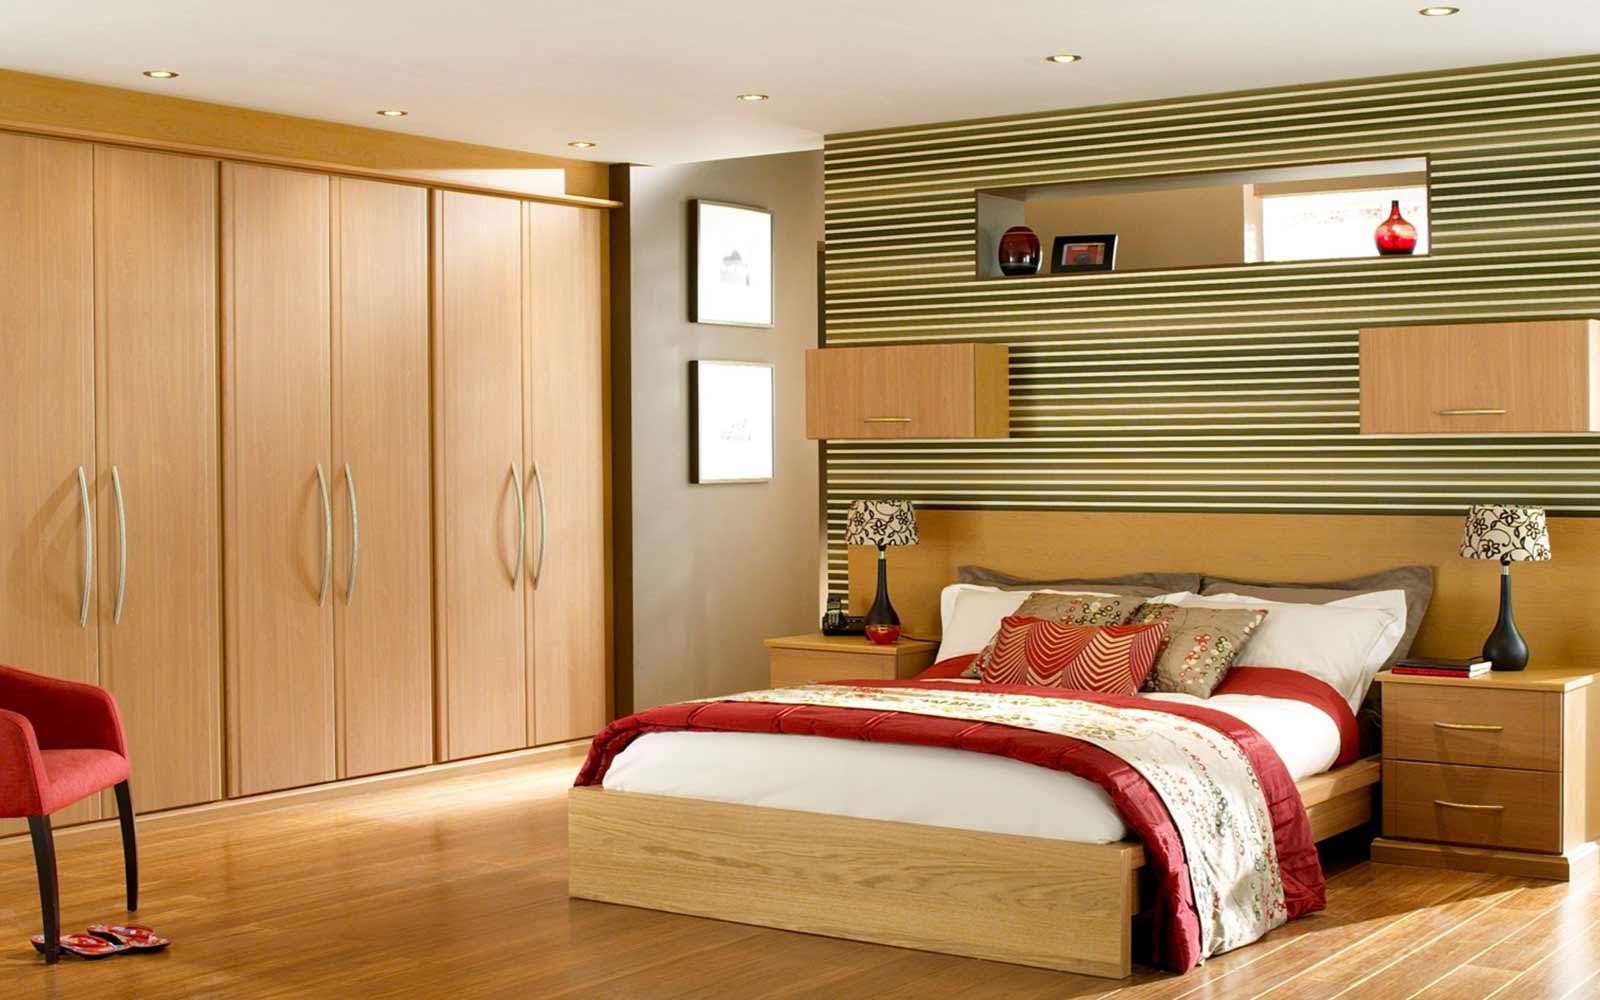 Bedroom Designs India - Bedroom   Bedroom Designs   Indian ...